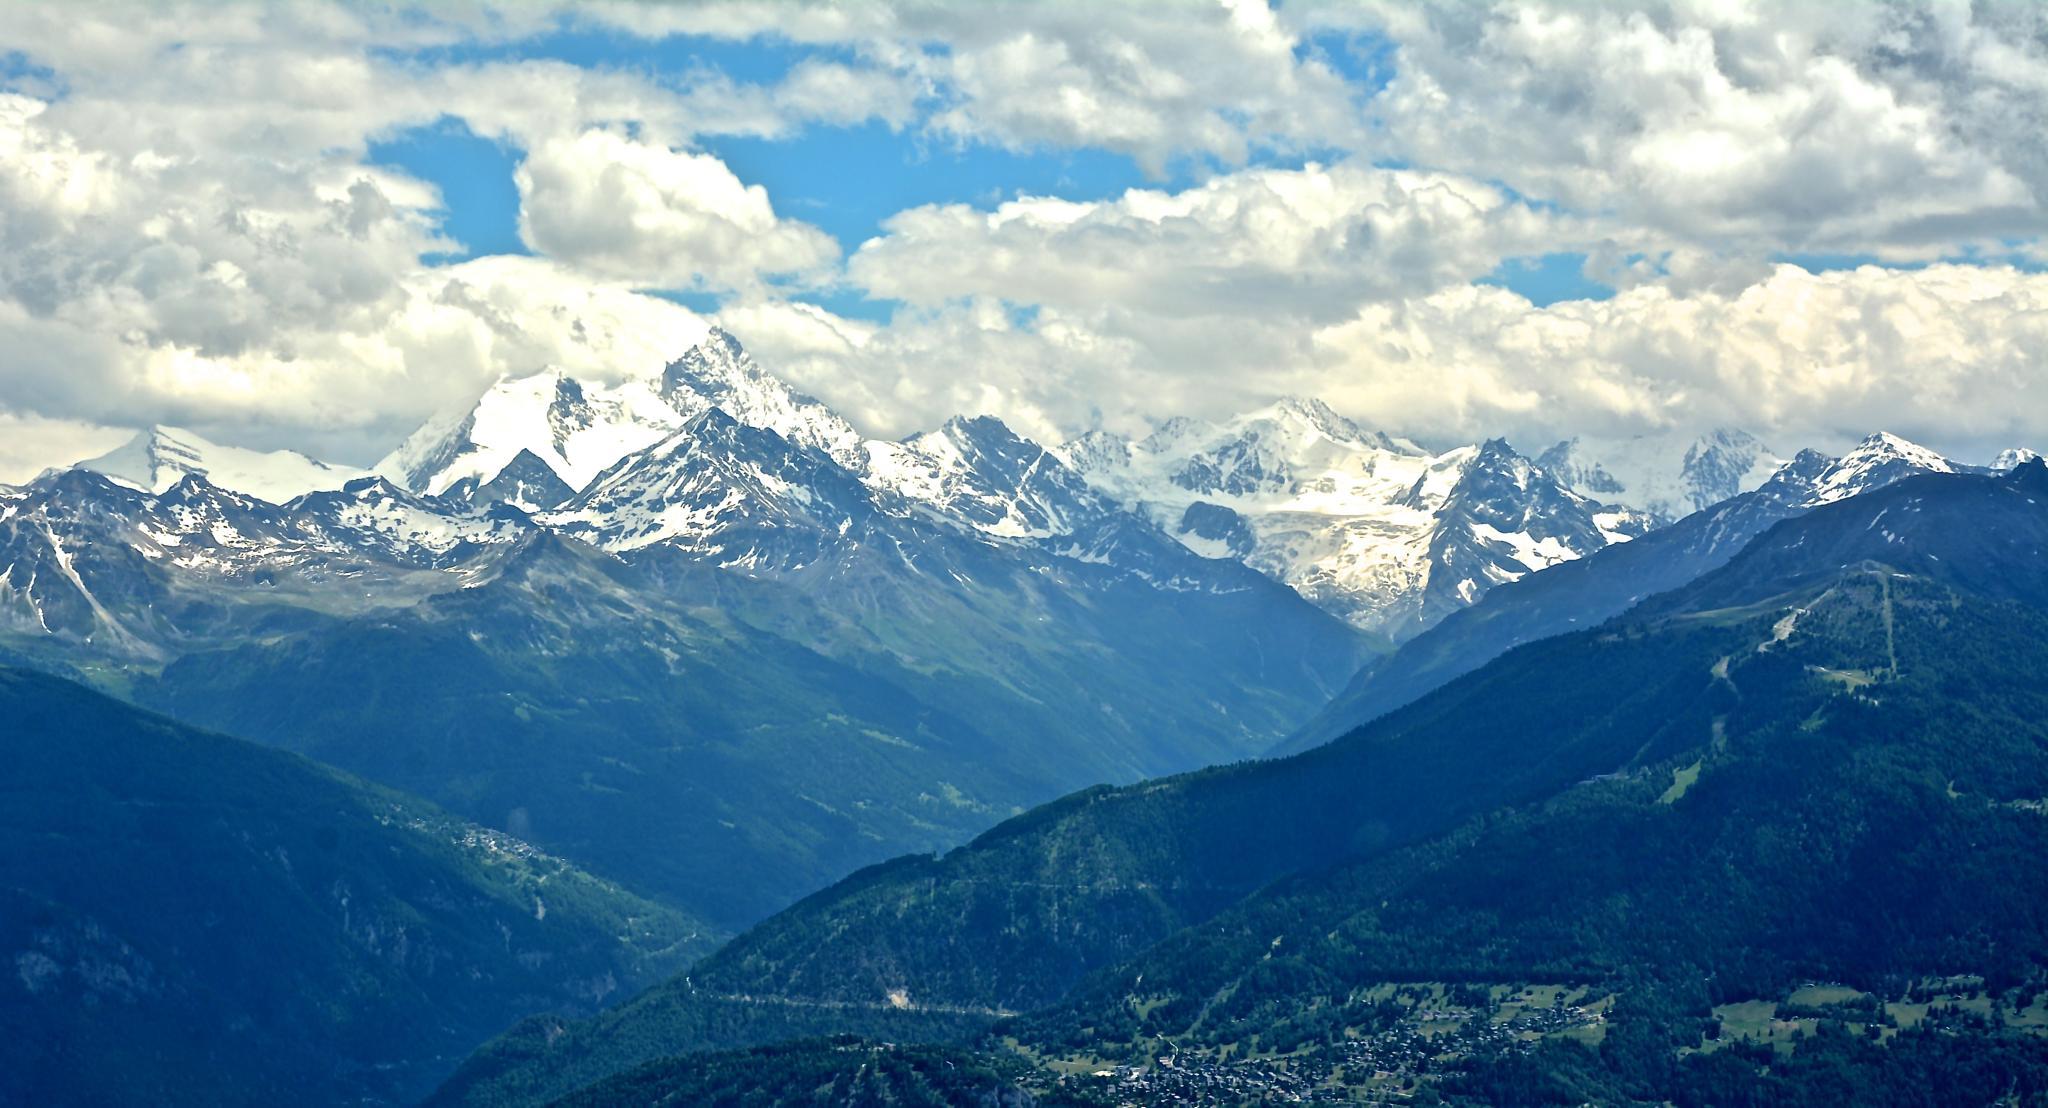 Cinematic Alps by floren